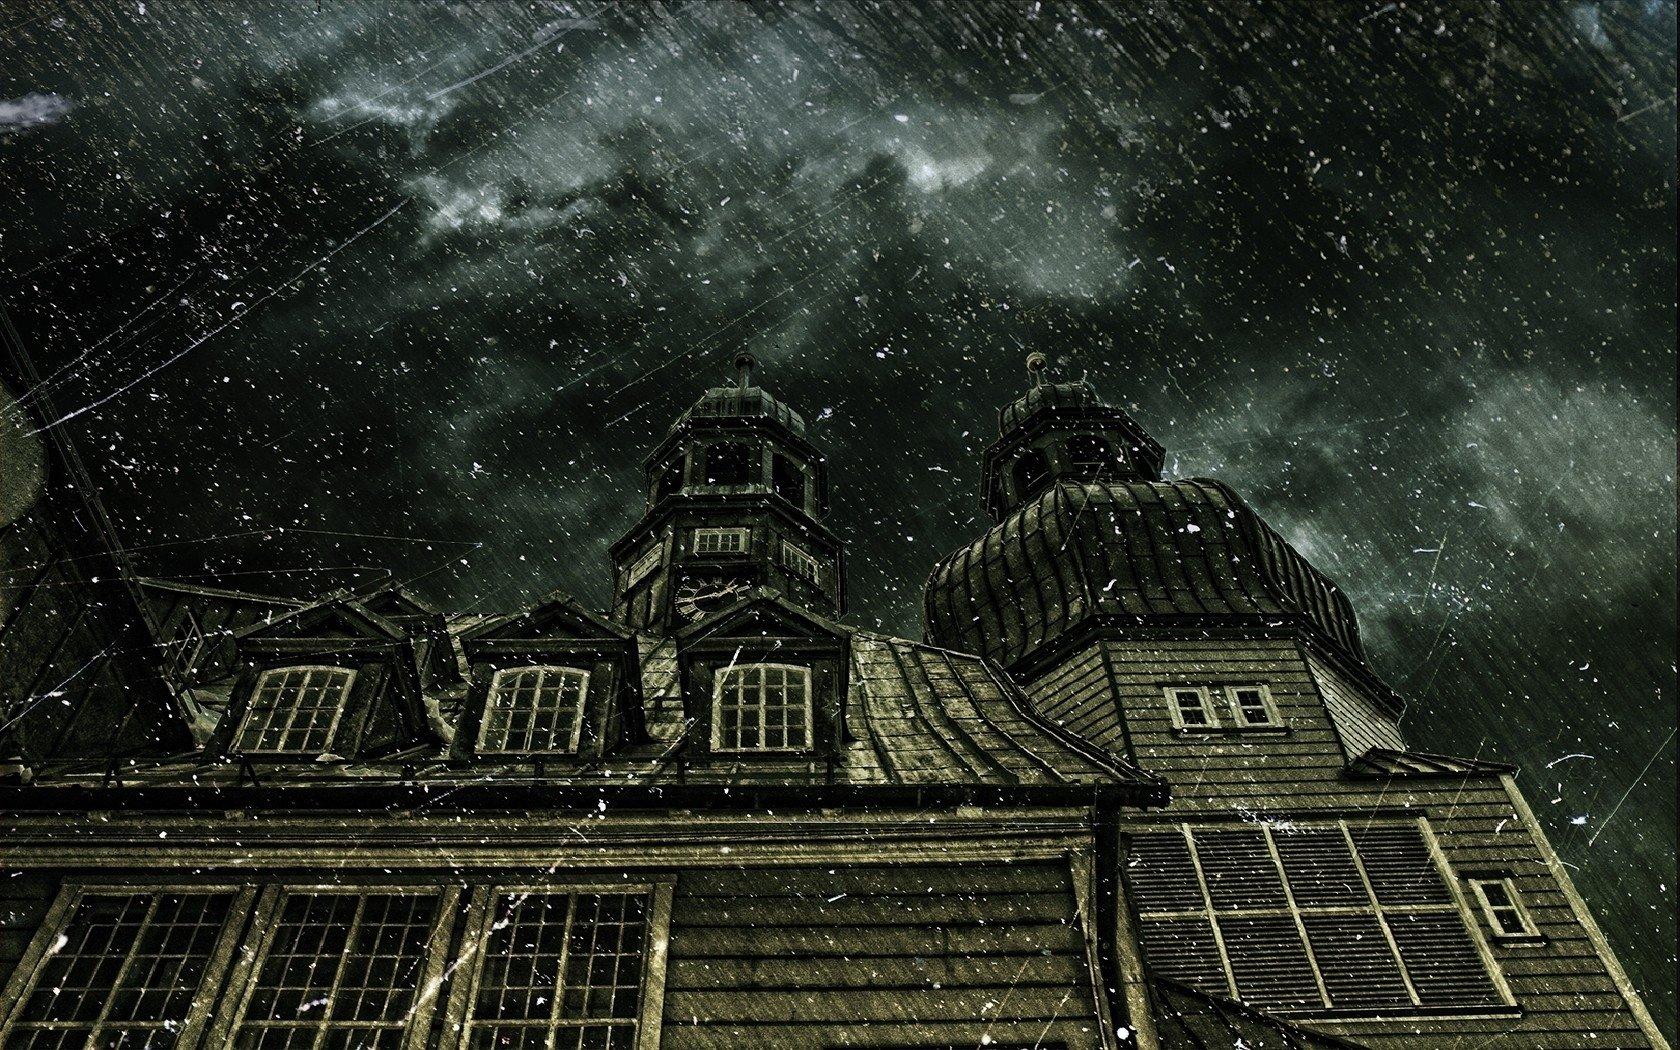 Wonderful Wallpaper Halloween Home Screen - thumb-1920-315869  Snapshot_434617.jpg